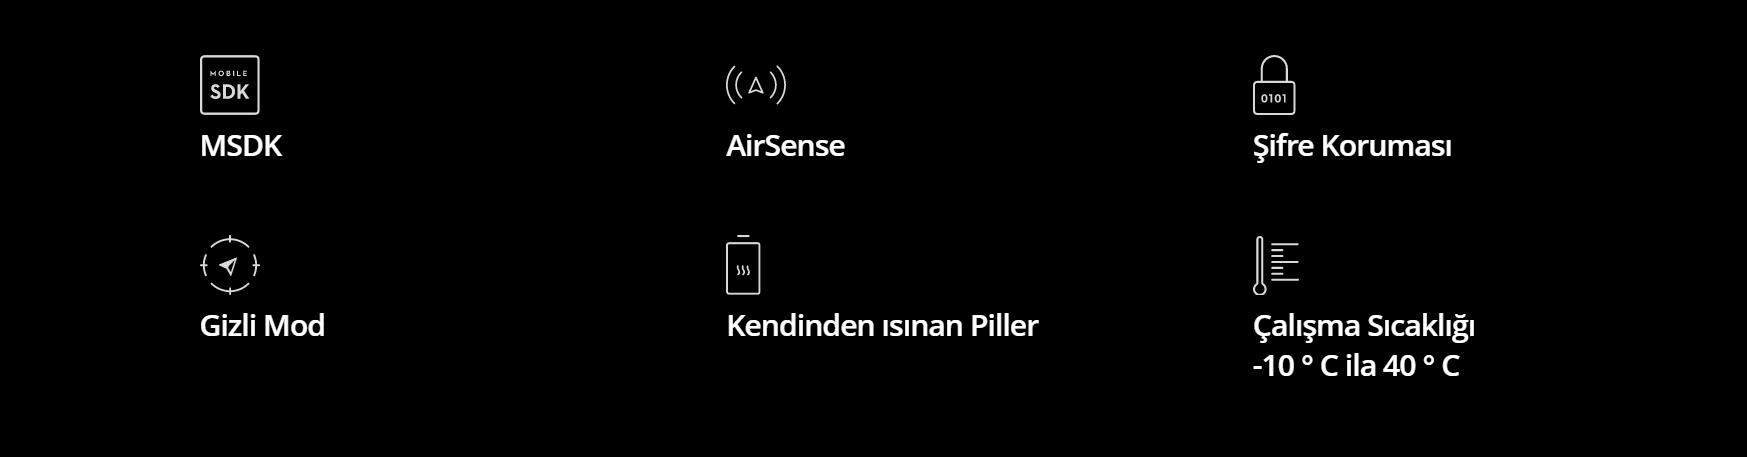 ek özellikler.png (30 KB)